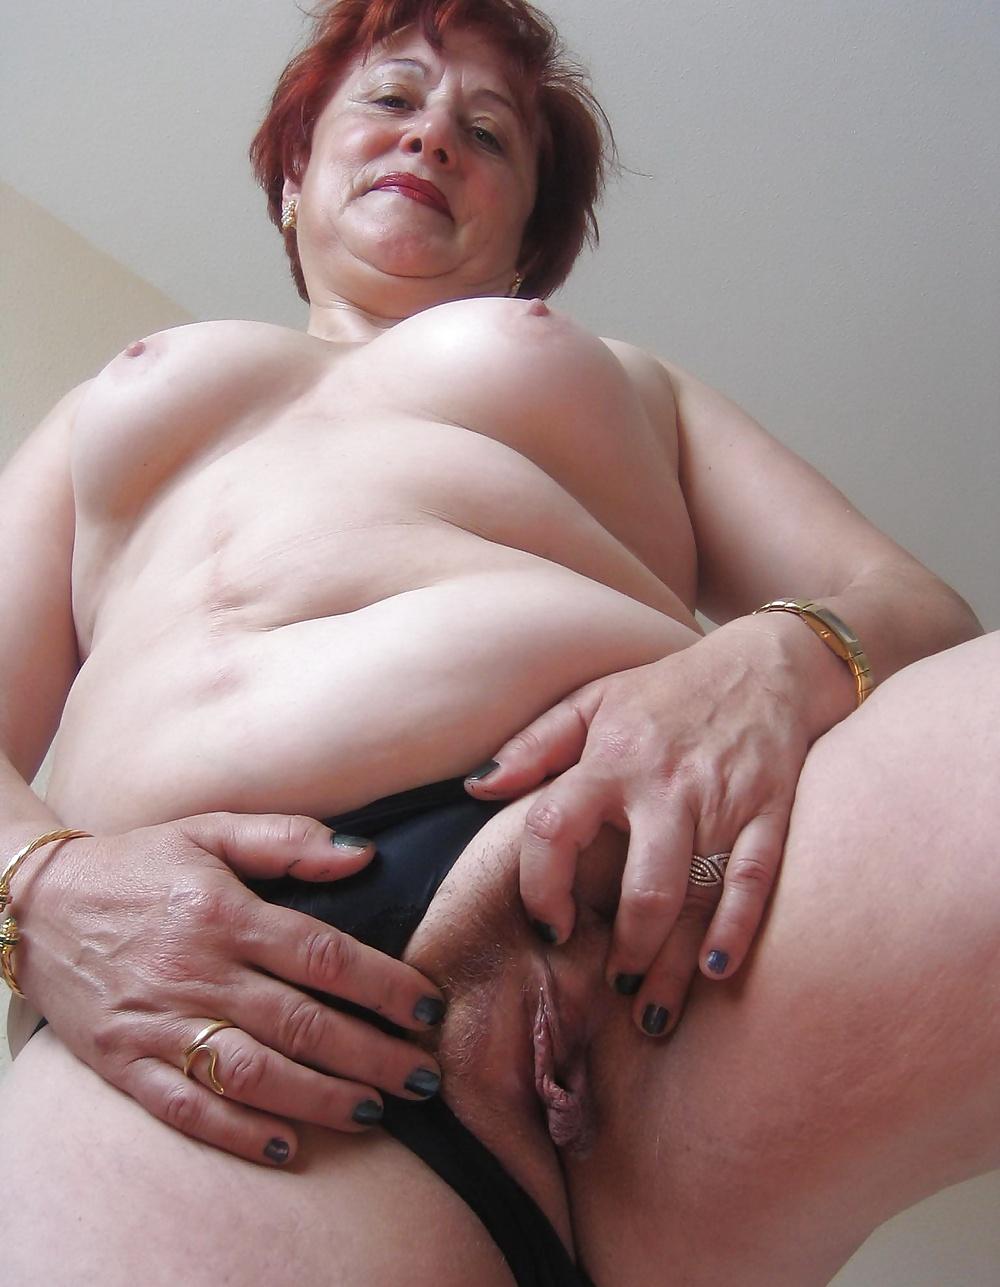 Horny Grandma Fucking Porn Galery Wet Old Pussy Pics